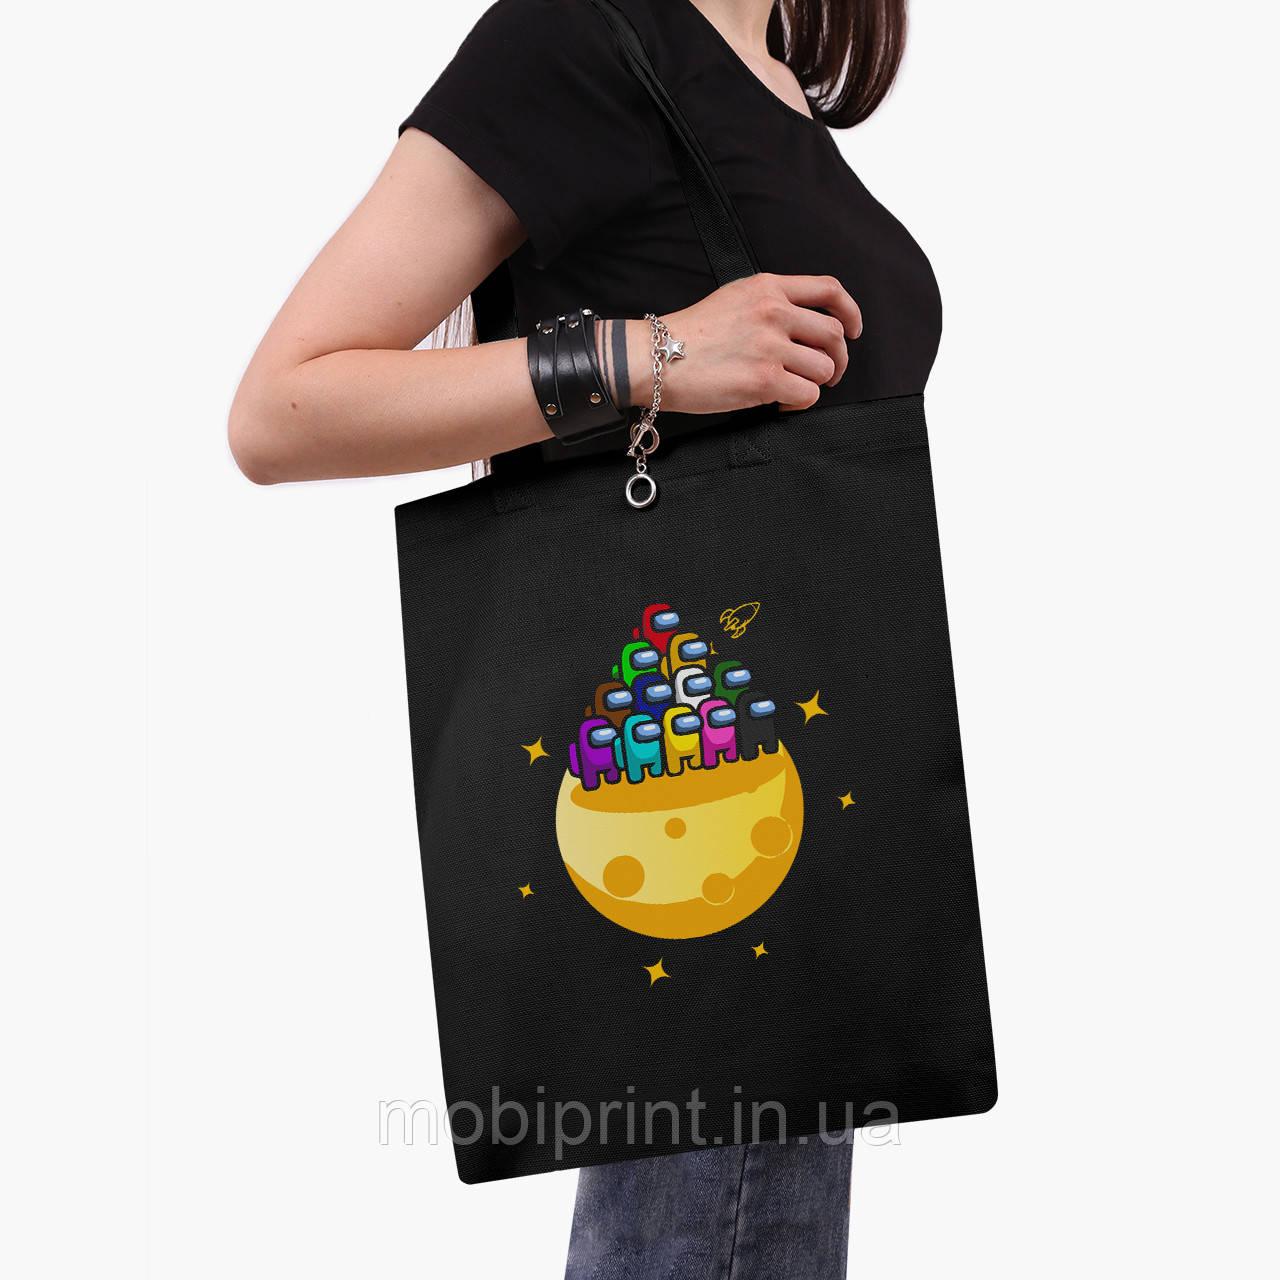 Еко сумка шоппер чорна Амонг Ас (Among Us) (9227-2584-2) 41*35 см